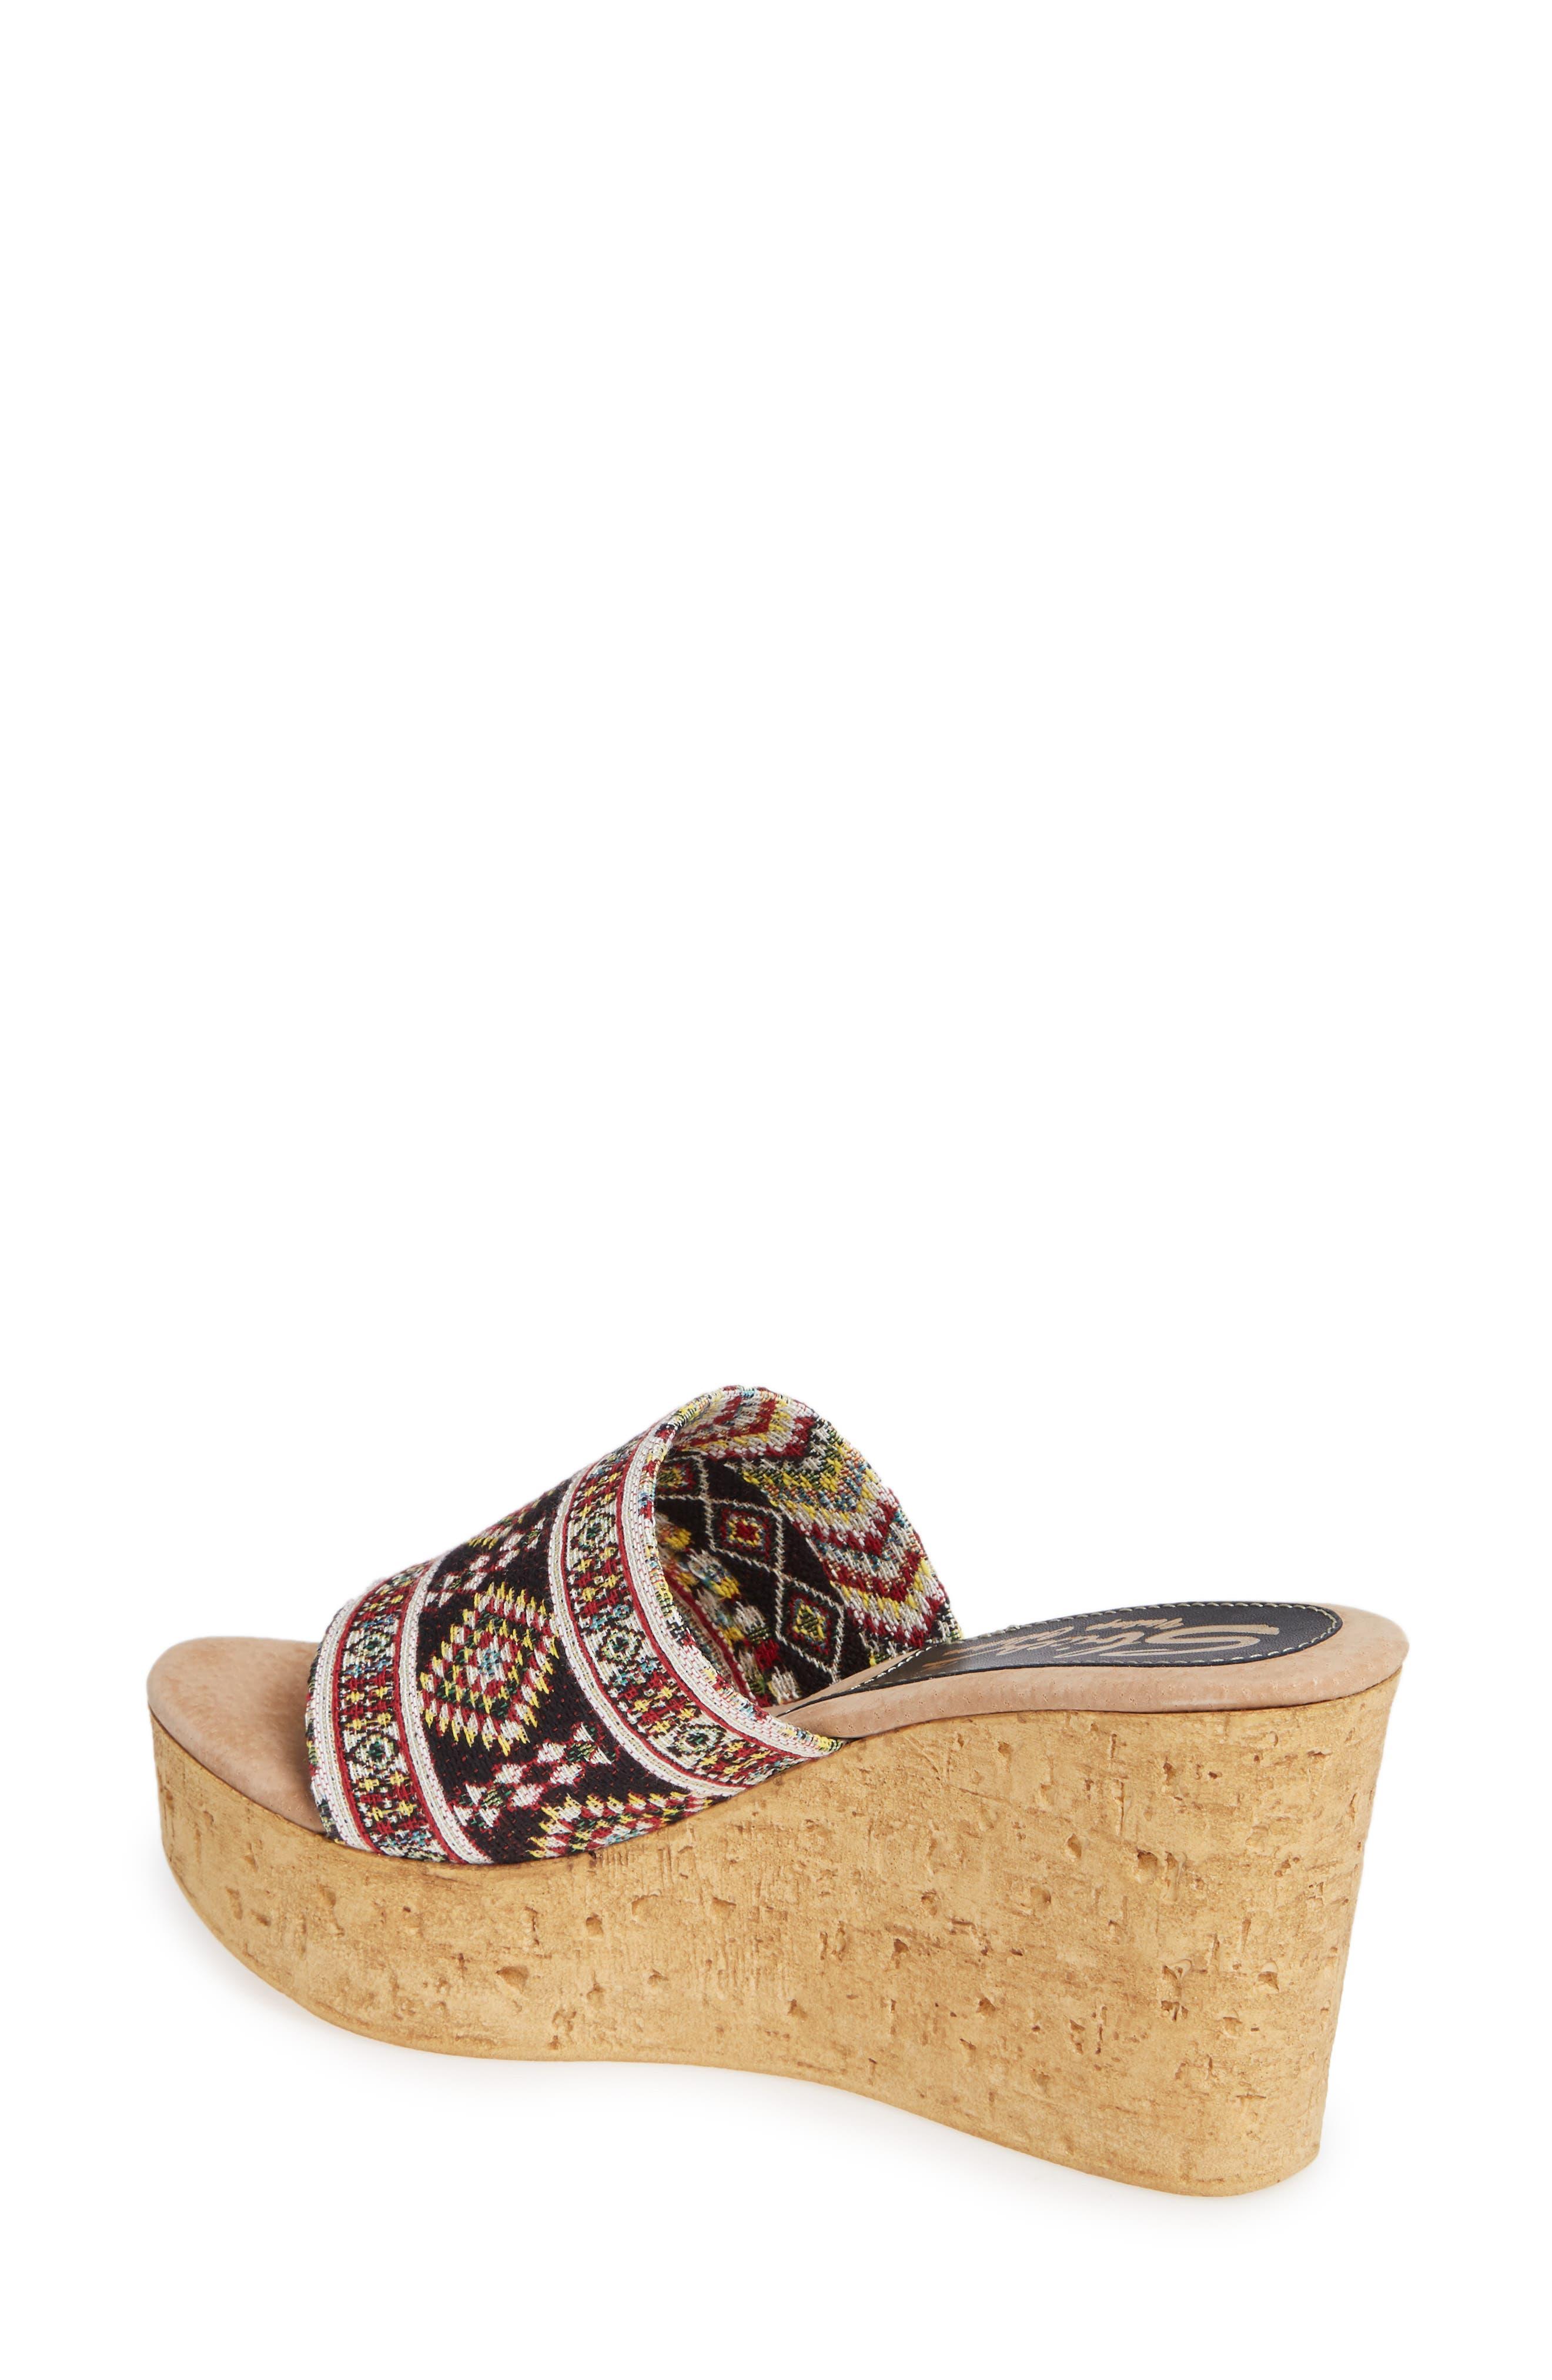 Orabela Platform Wedge Sandal,                             Alternate thumbnail 2, color,                             BLACK MULTICOLOR FABRIC